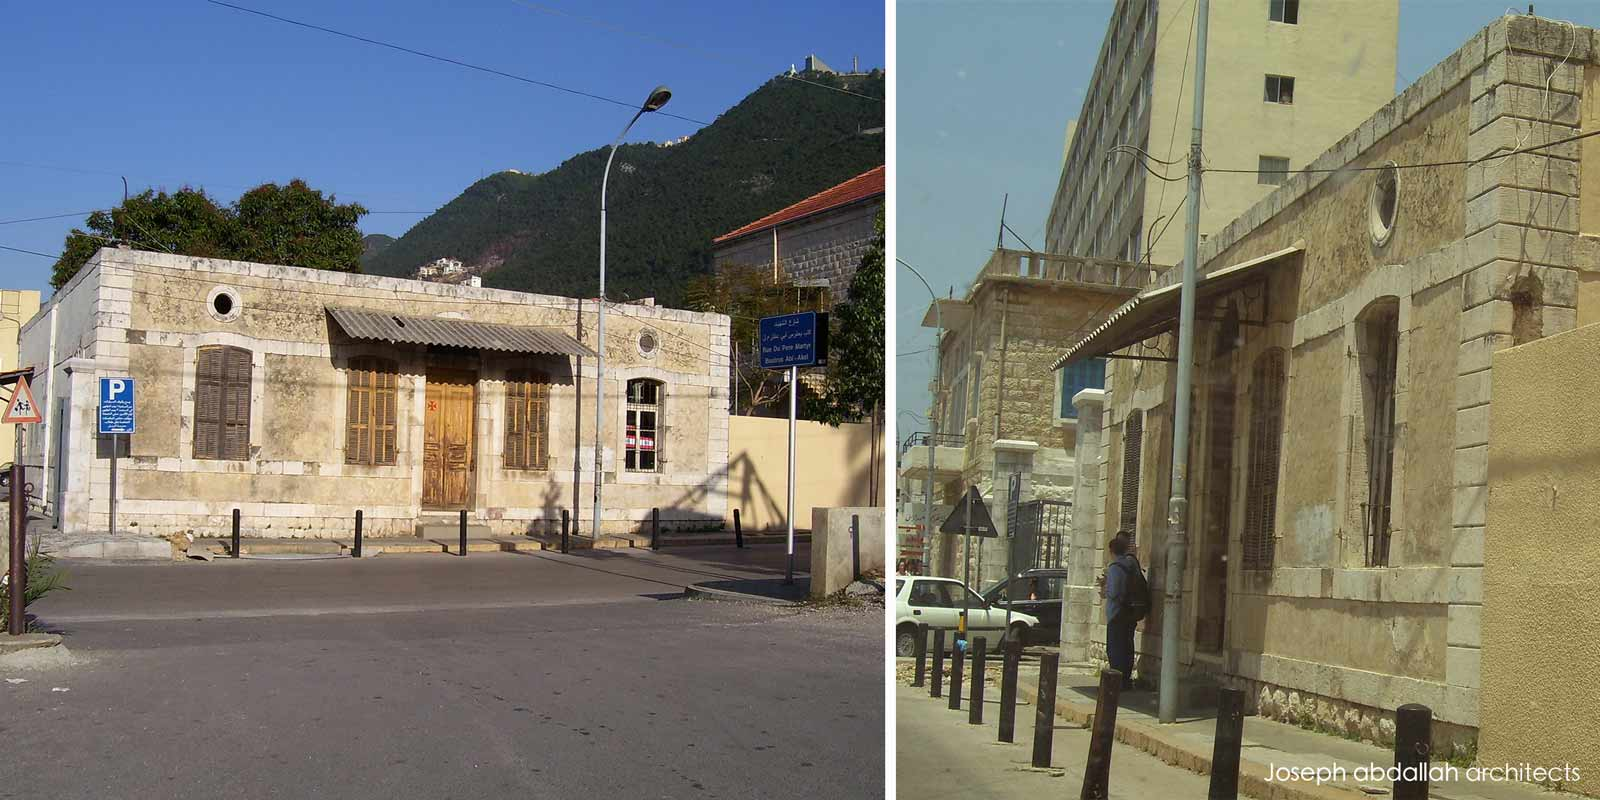 bank-lcb-sgbl-apotres-restoration-architecture-joseph-abdallah-architects-2